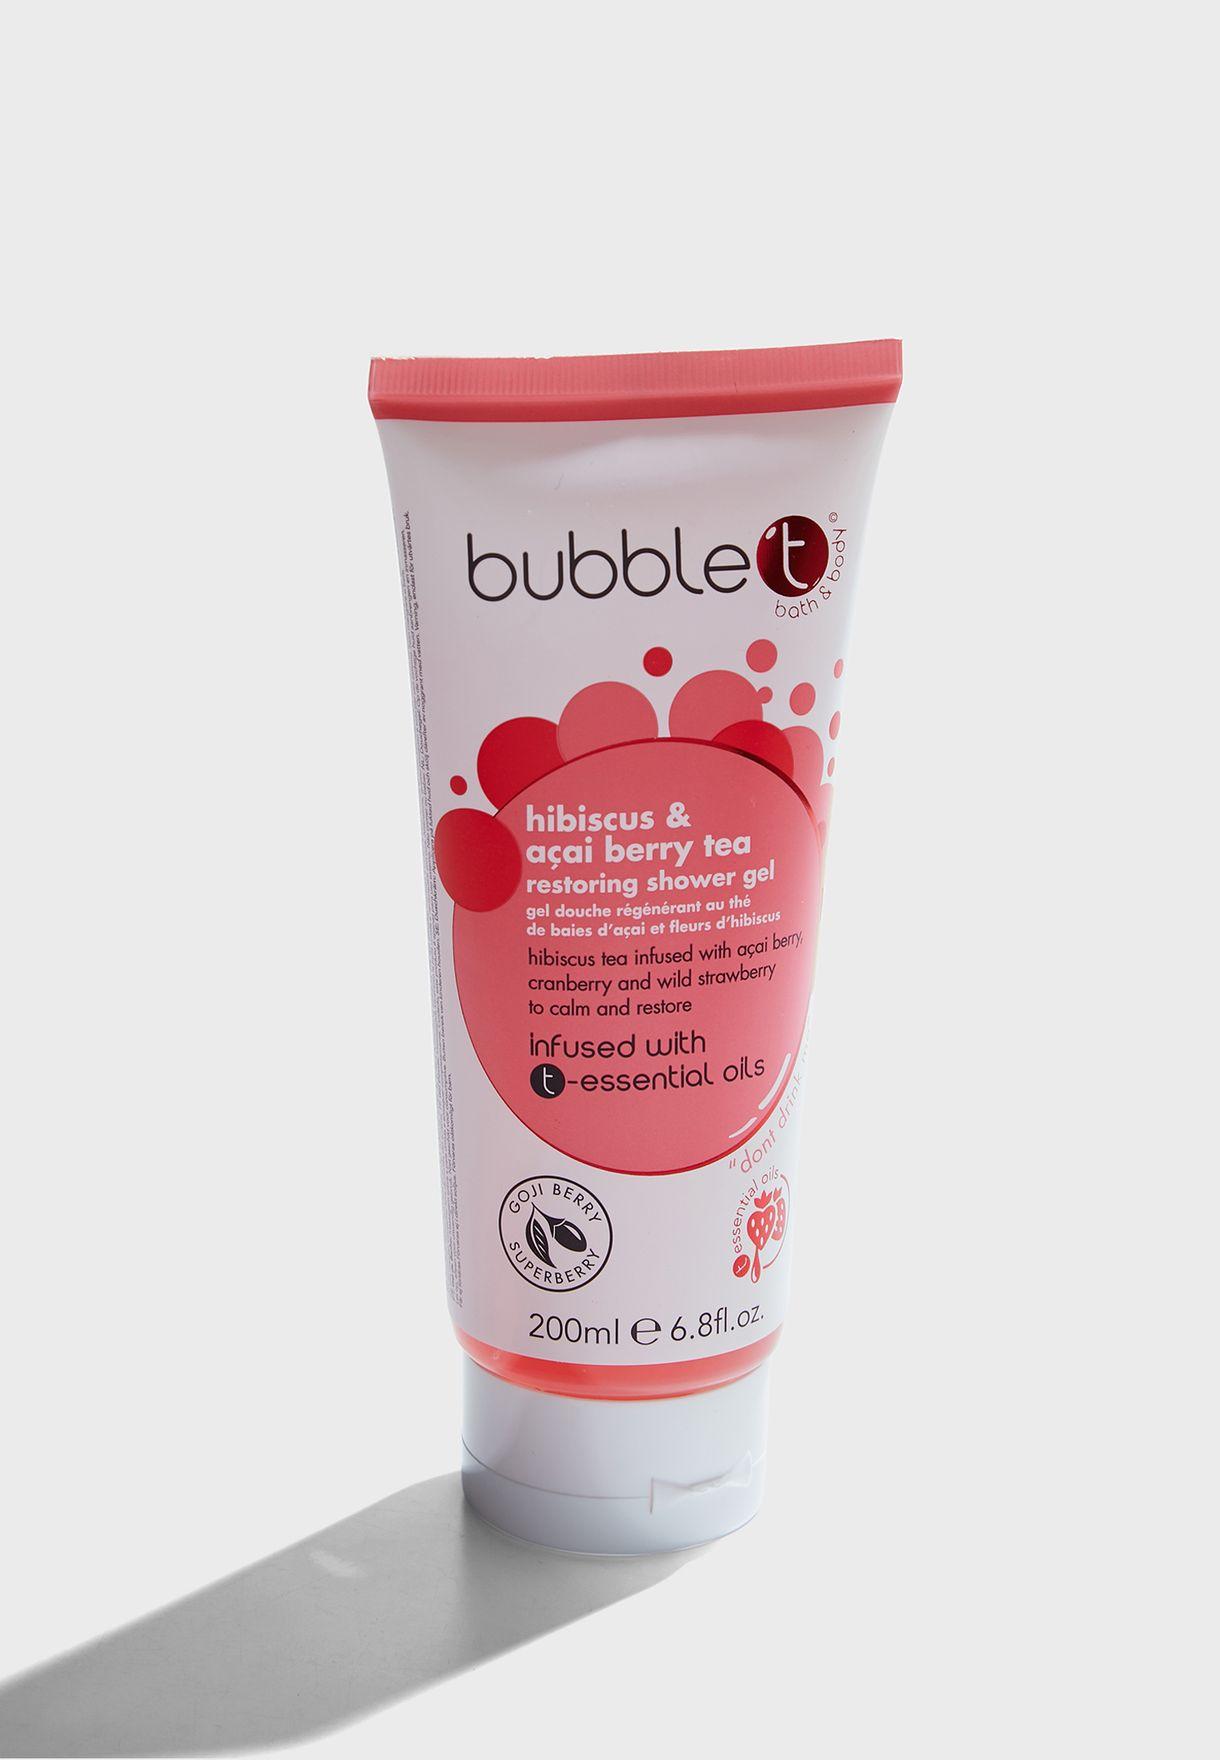 Hibiscus & Acai Berry Shower Gel